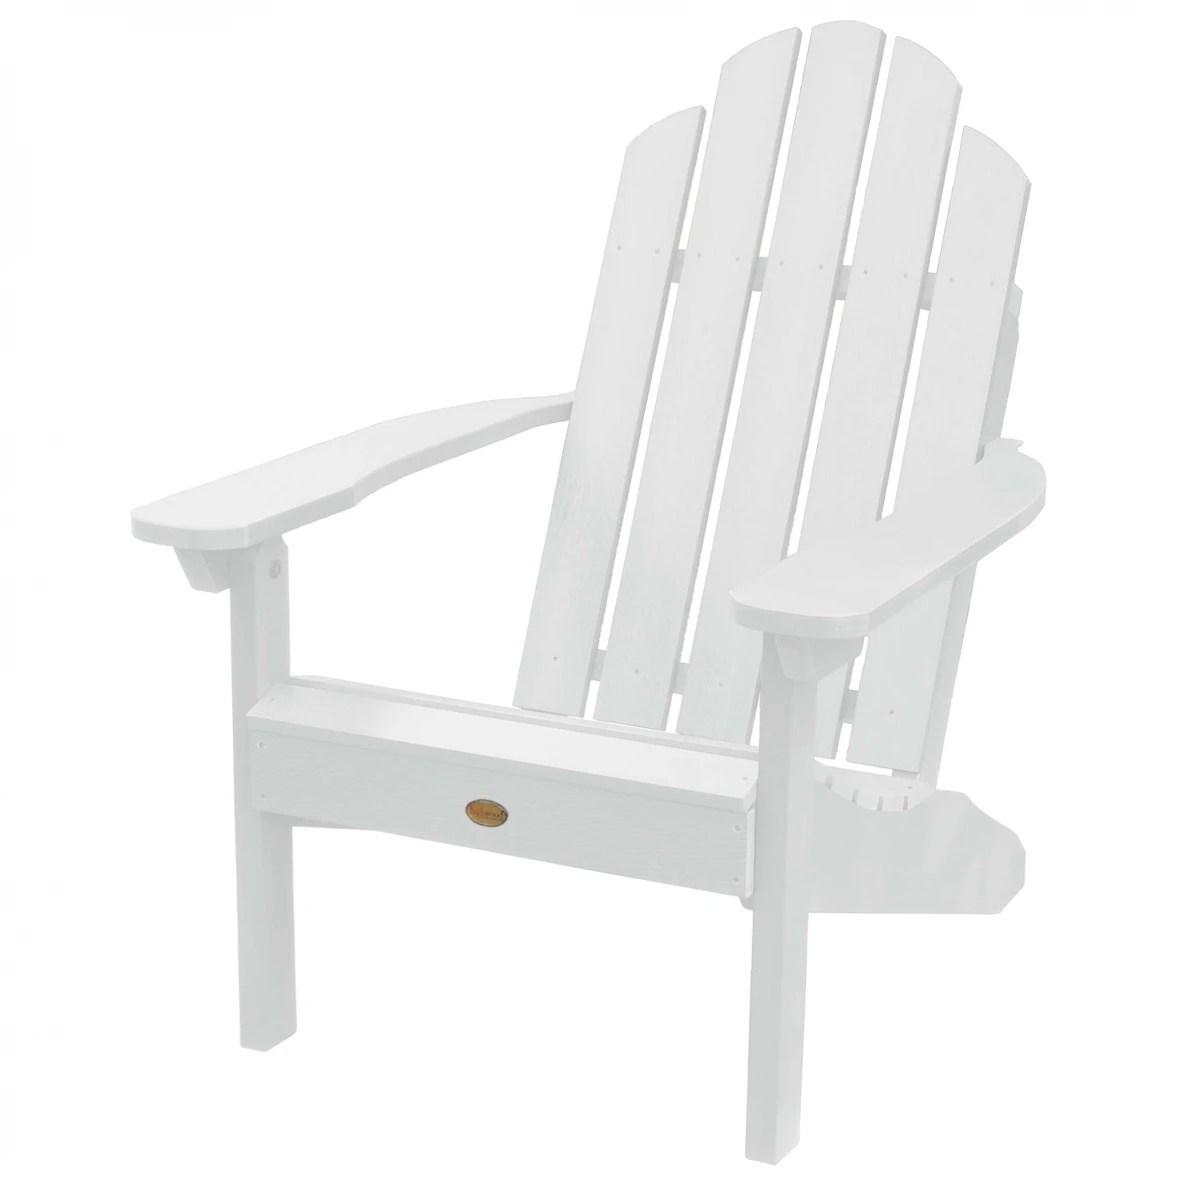 Highwood Classic Westport Adirondack Chair in White